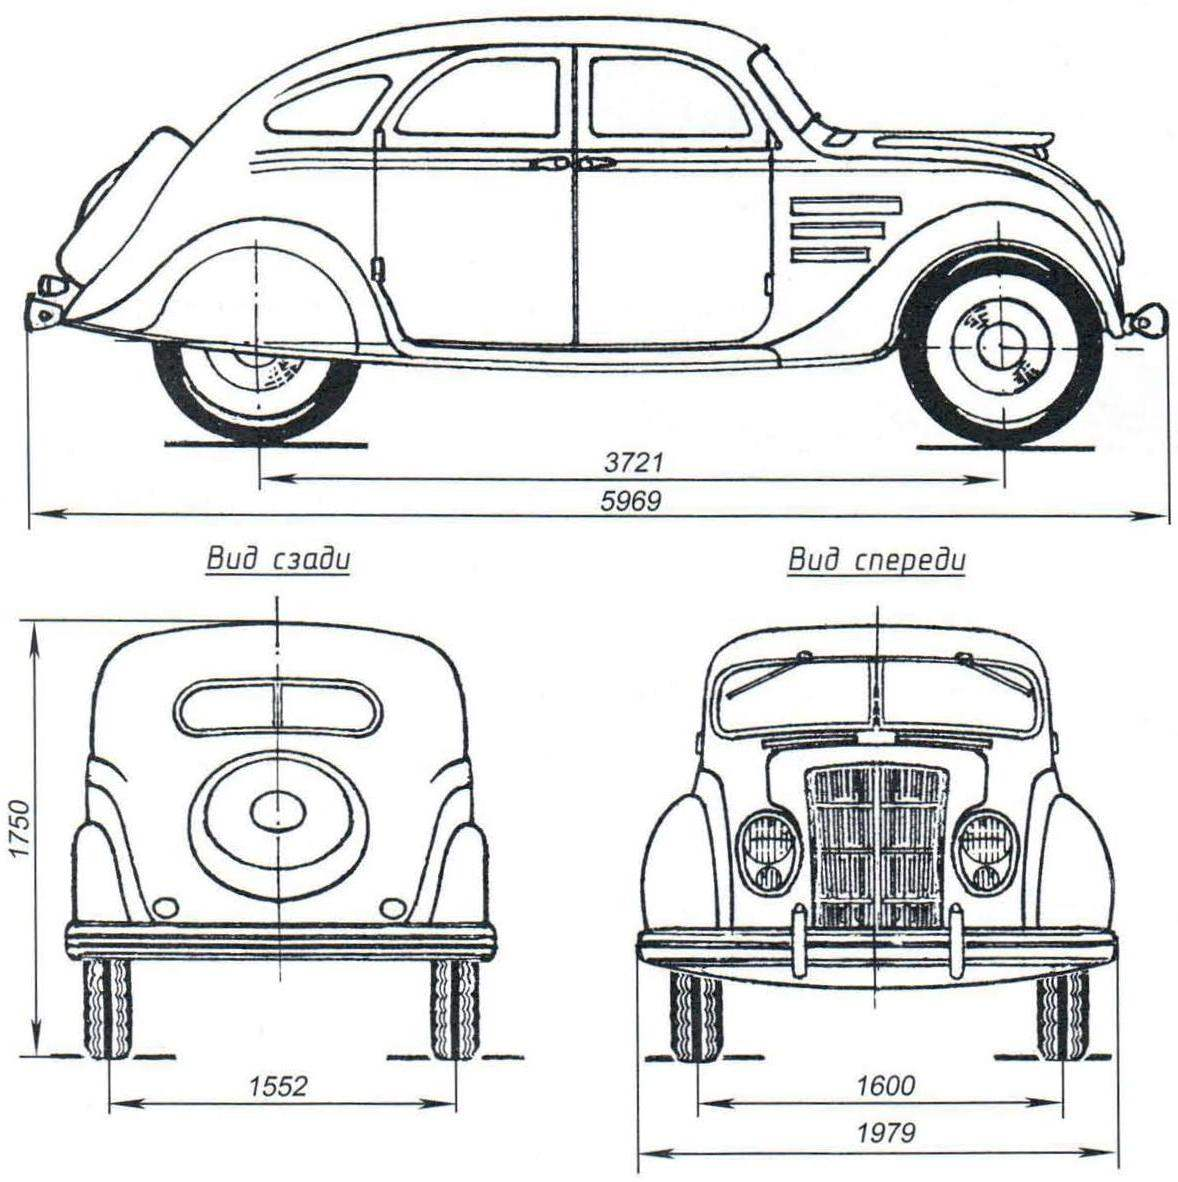 Основные размеры автомобиля Chrysler Airflow